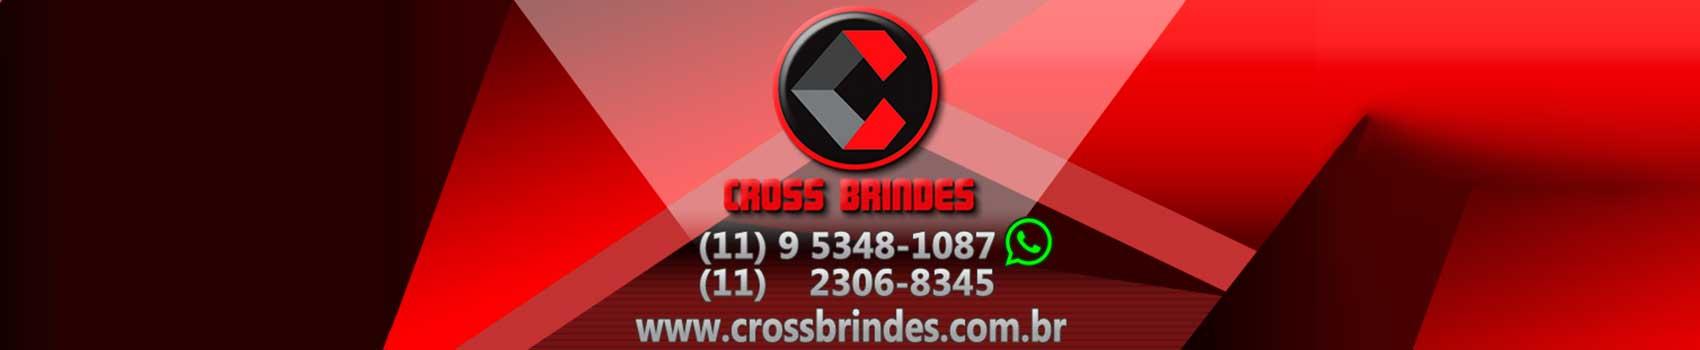 Cross Brindes